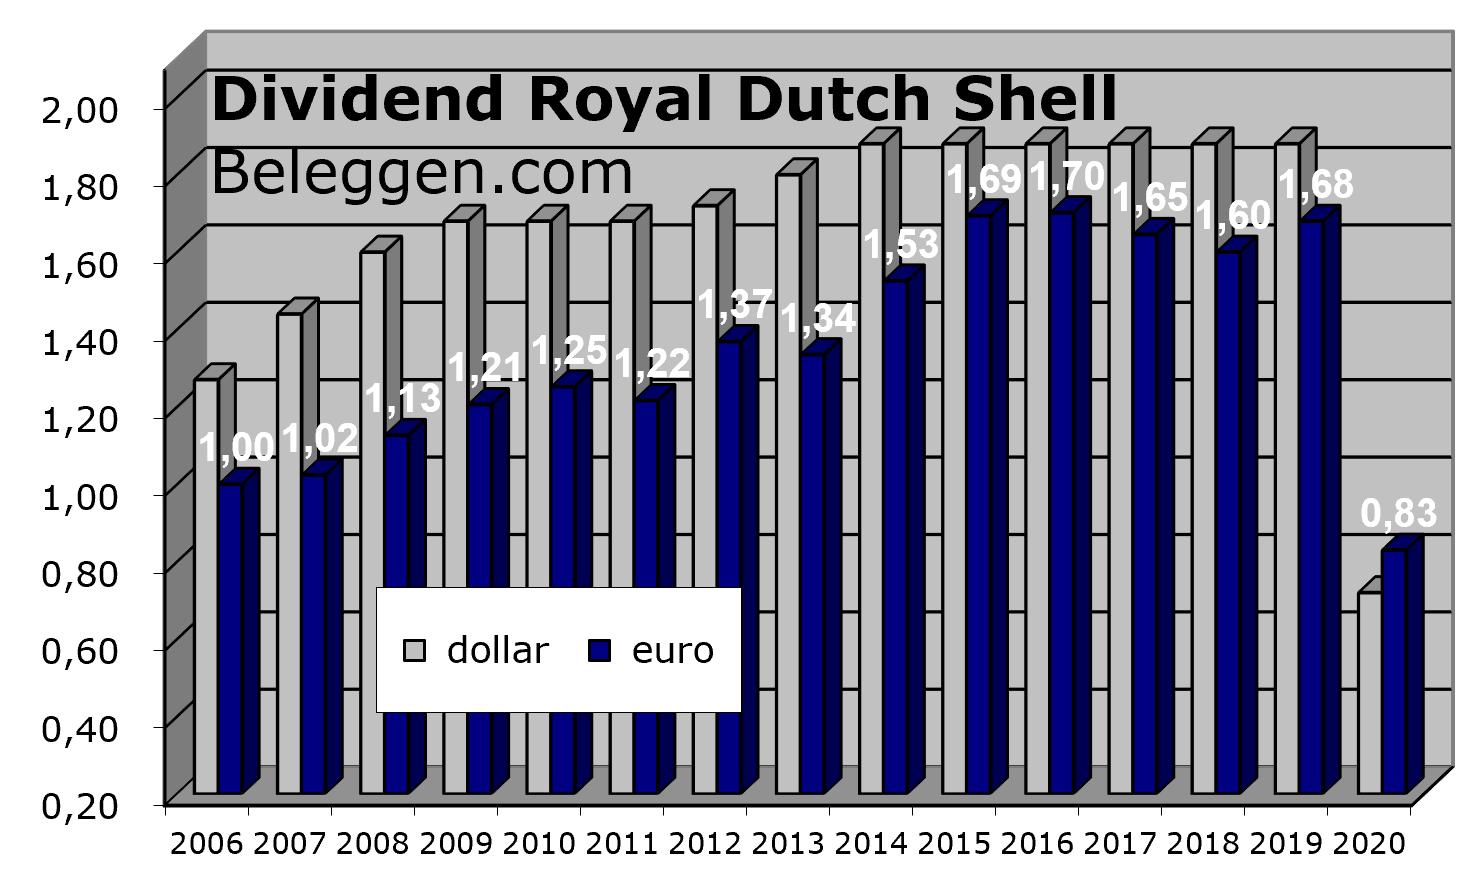 Dividendrendement RDS Shell